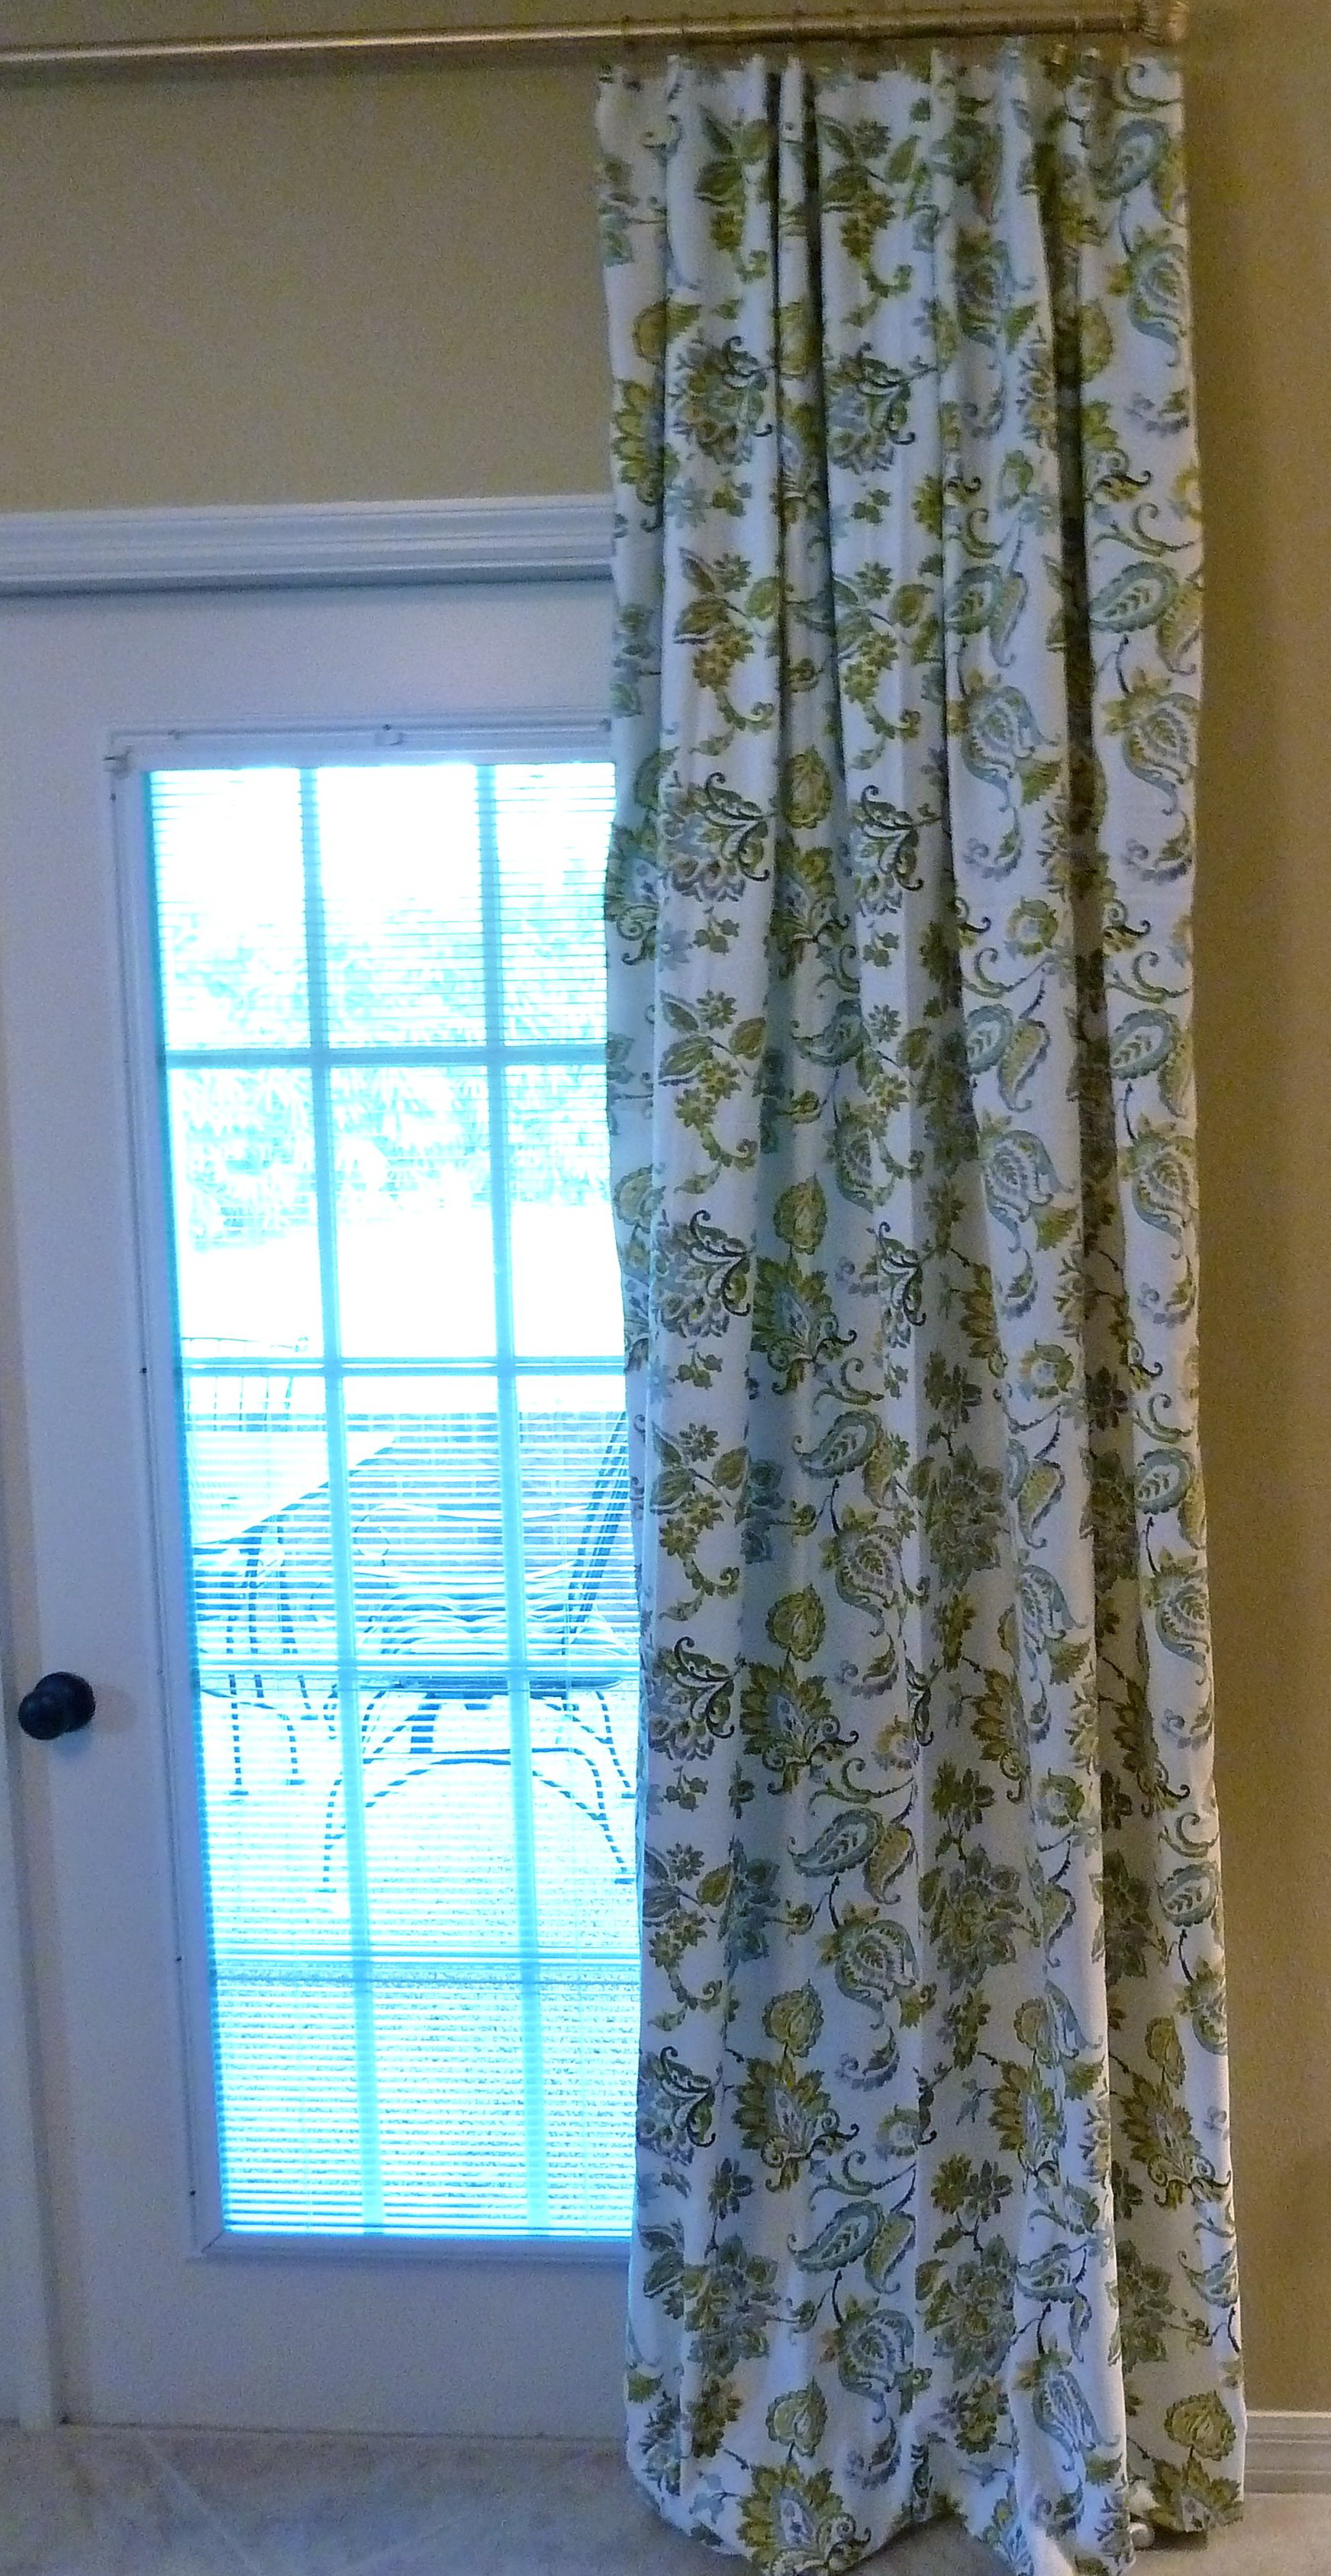 curtain rods for door panels home design ideas. Black Bedroom Furniture Sets. Home Design Ideas